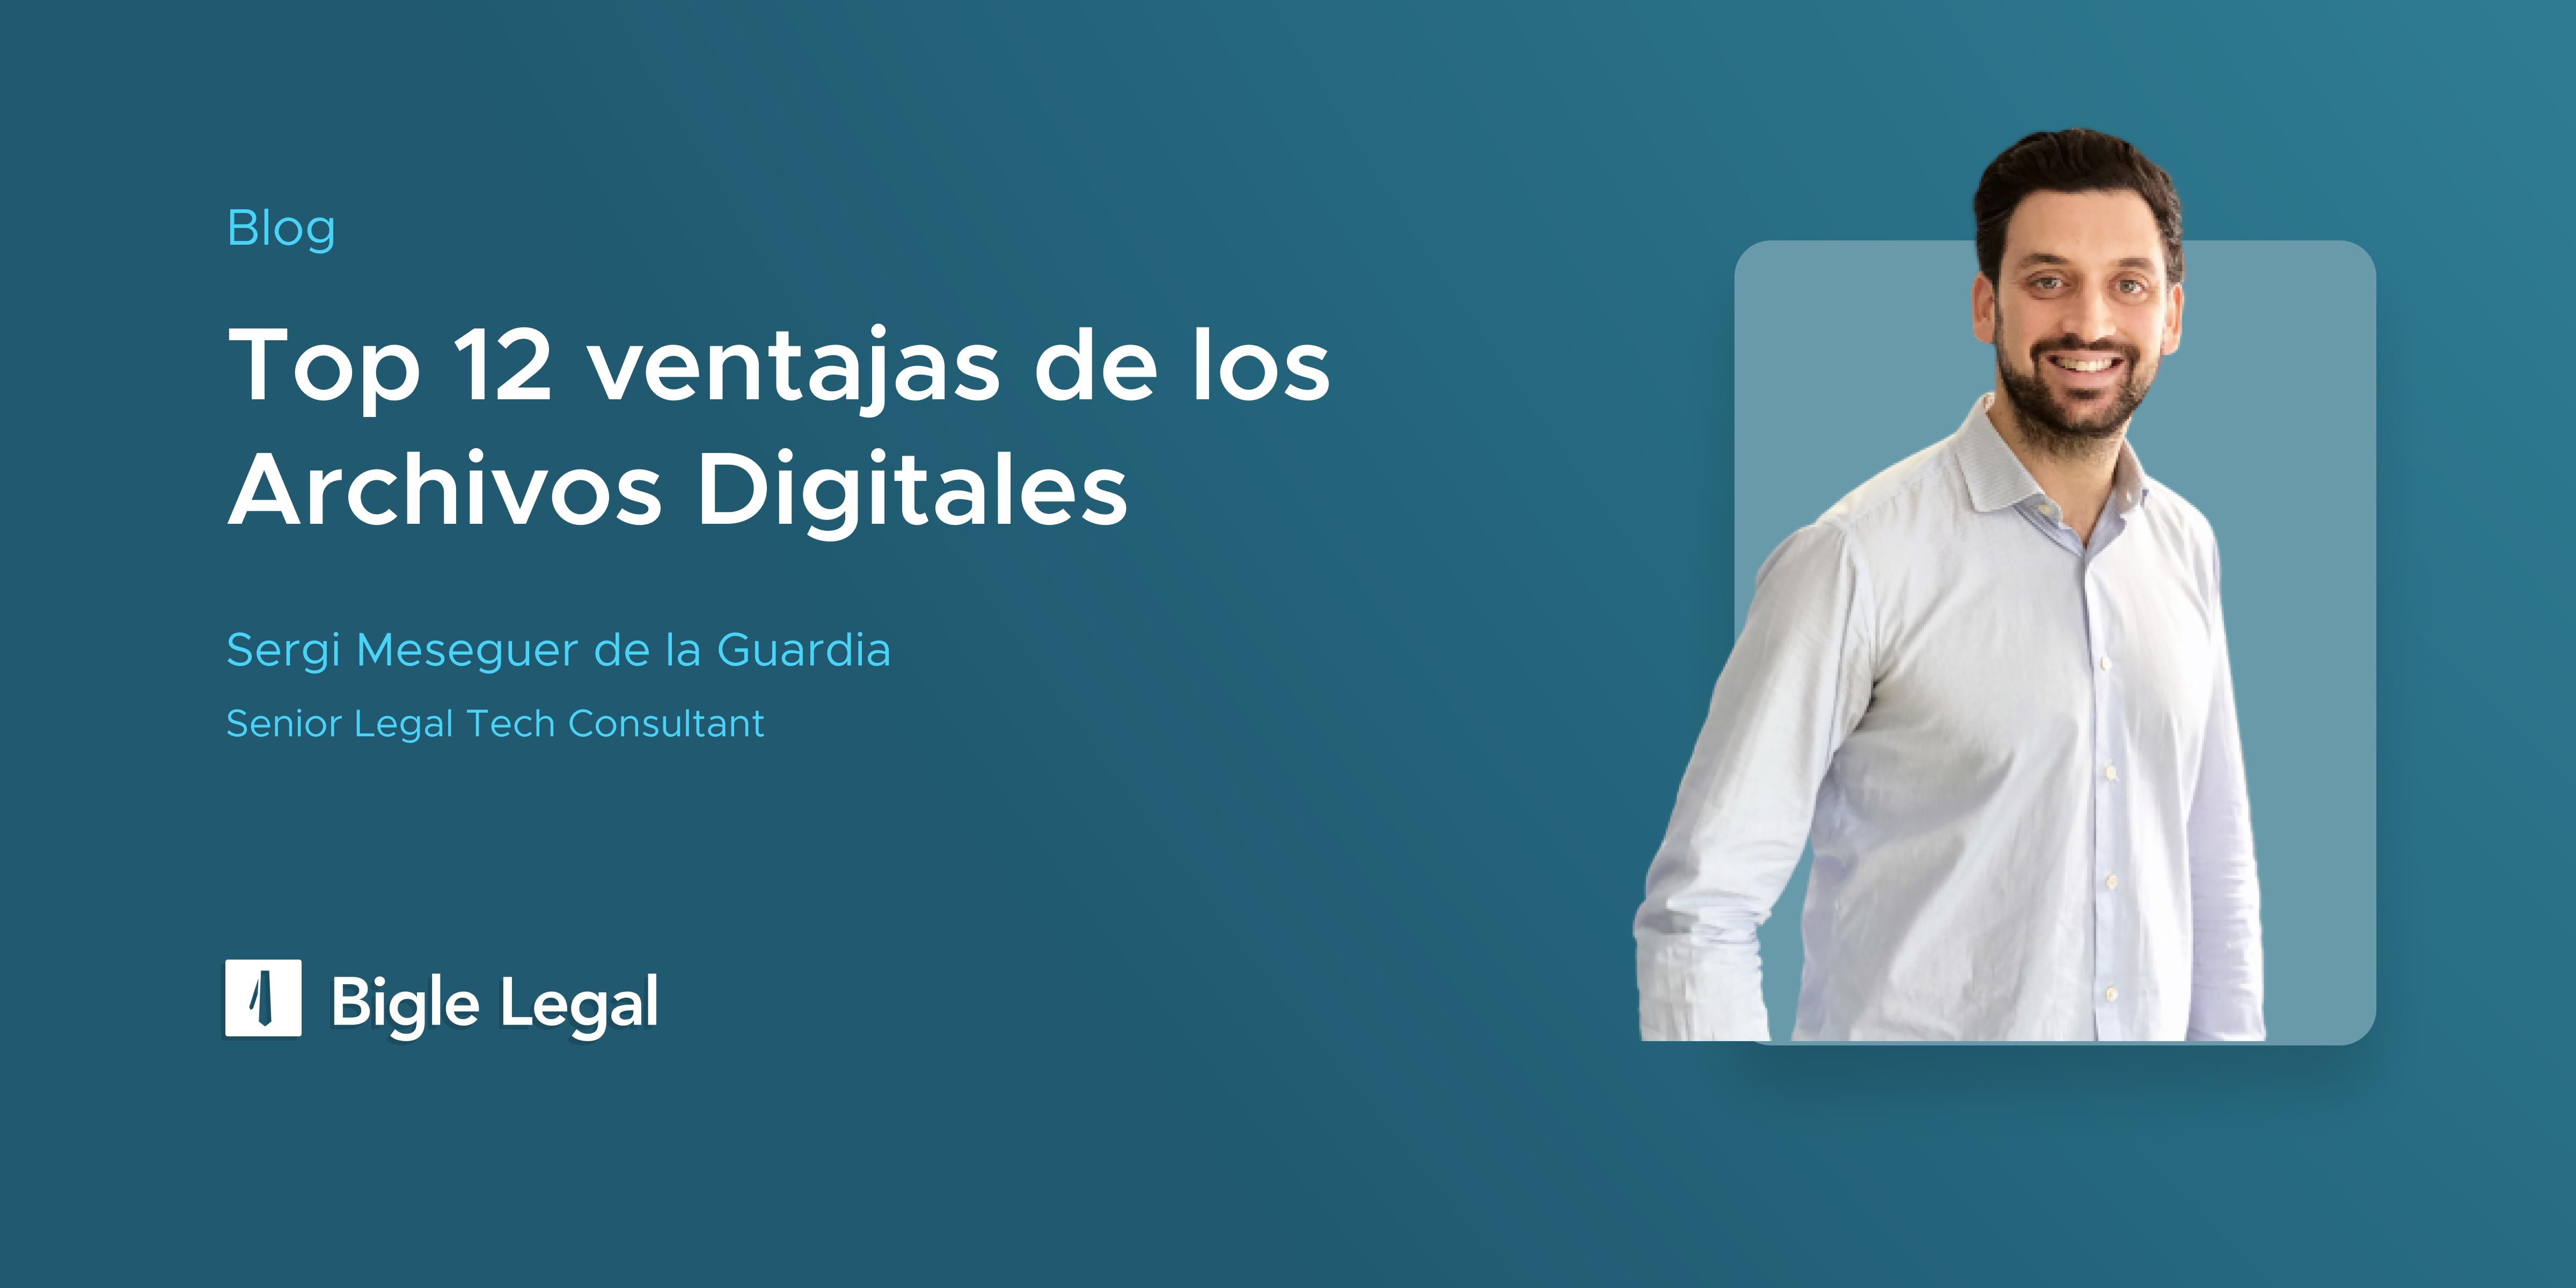 Archivos Digitales - Bigle Legal